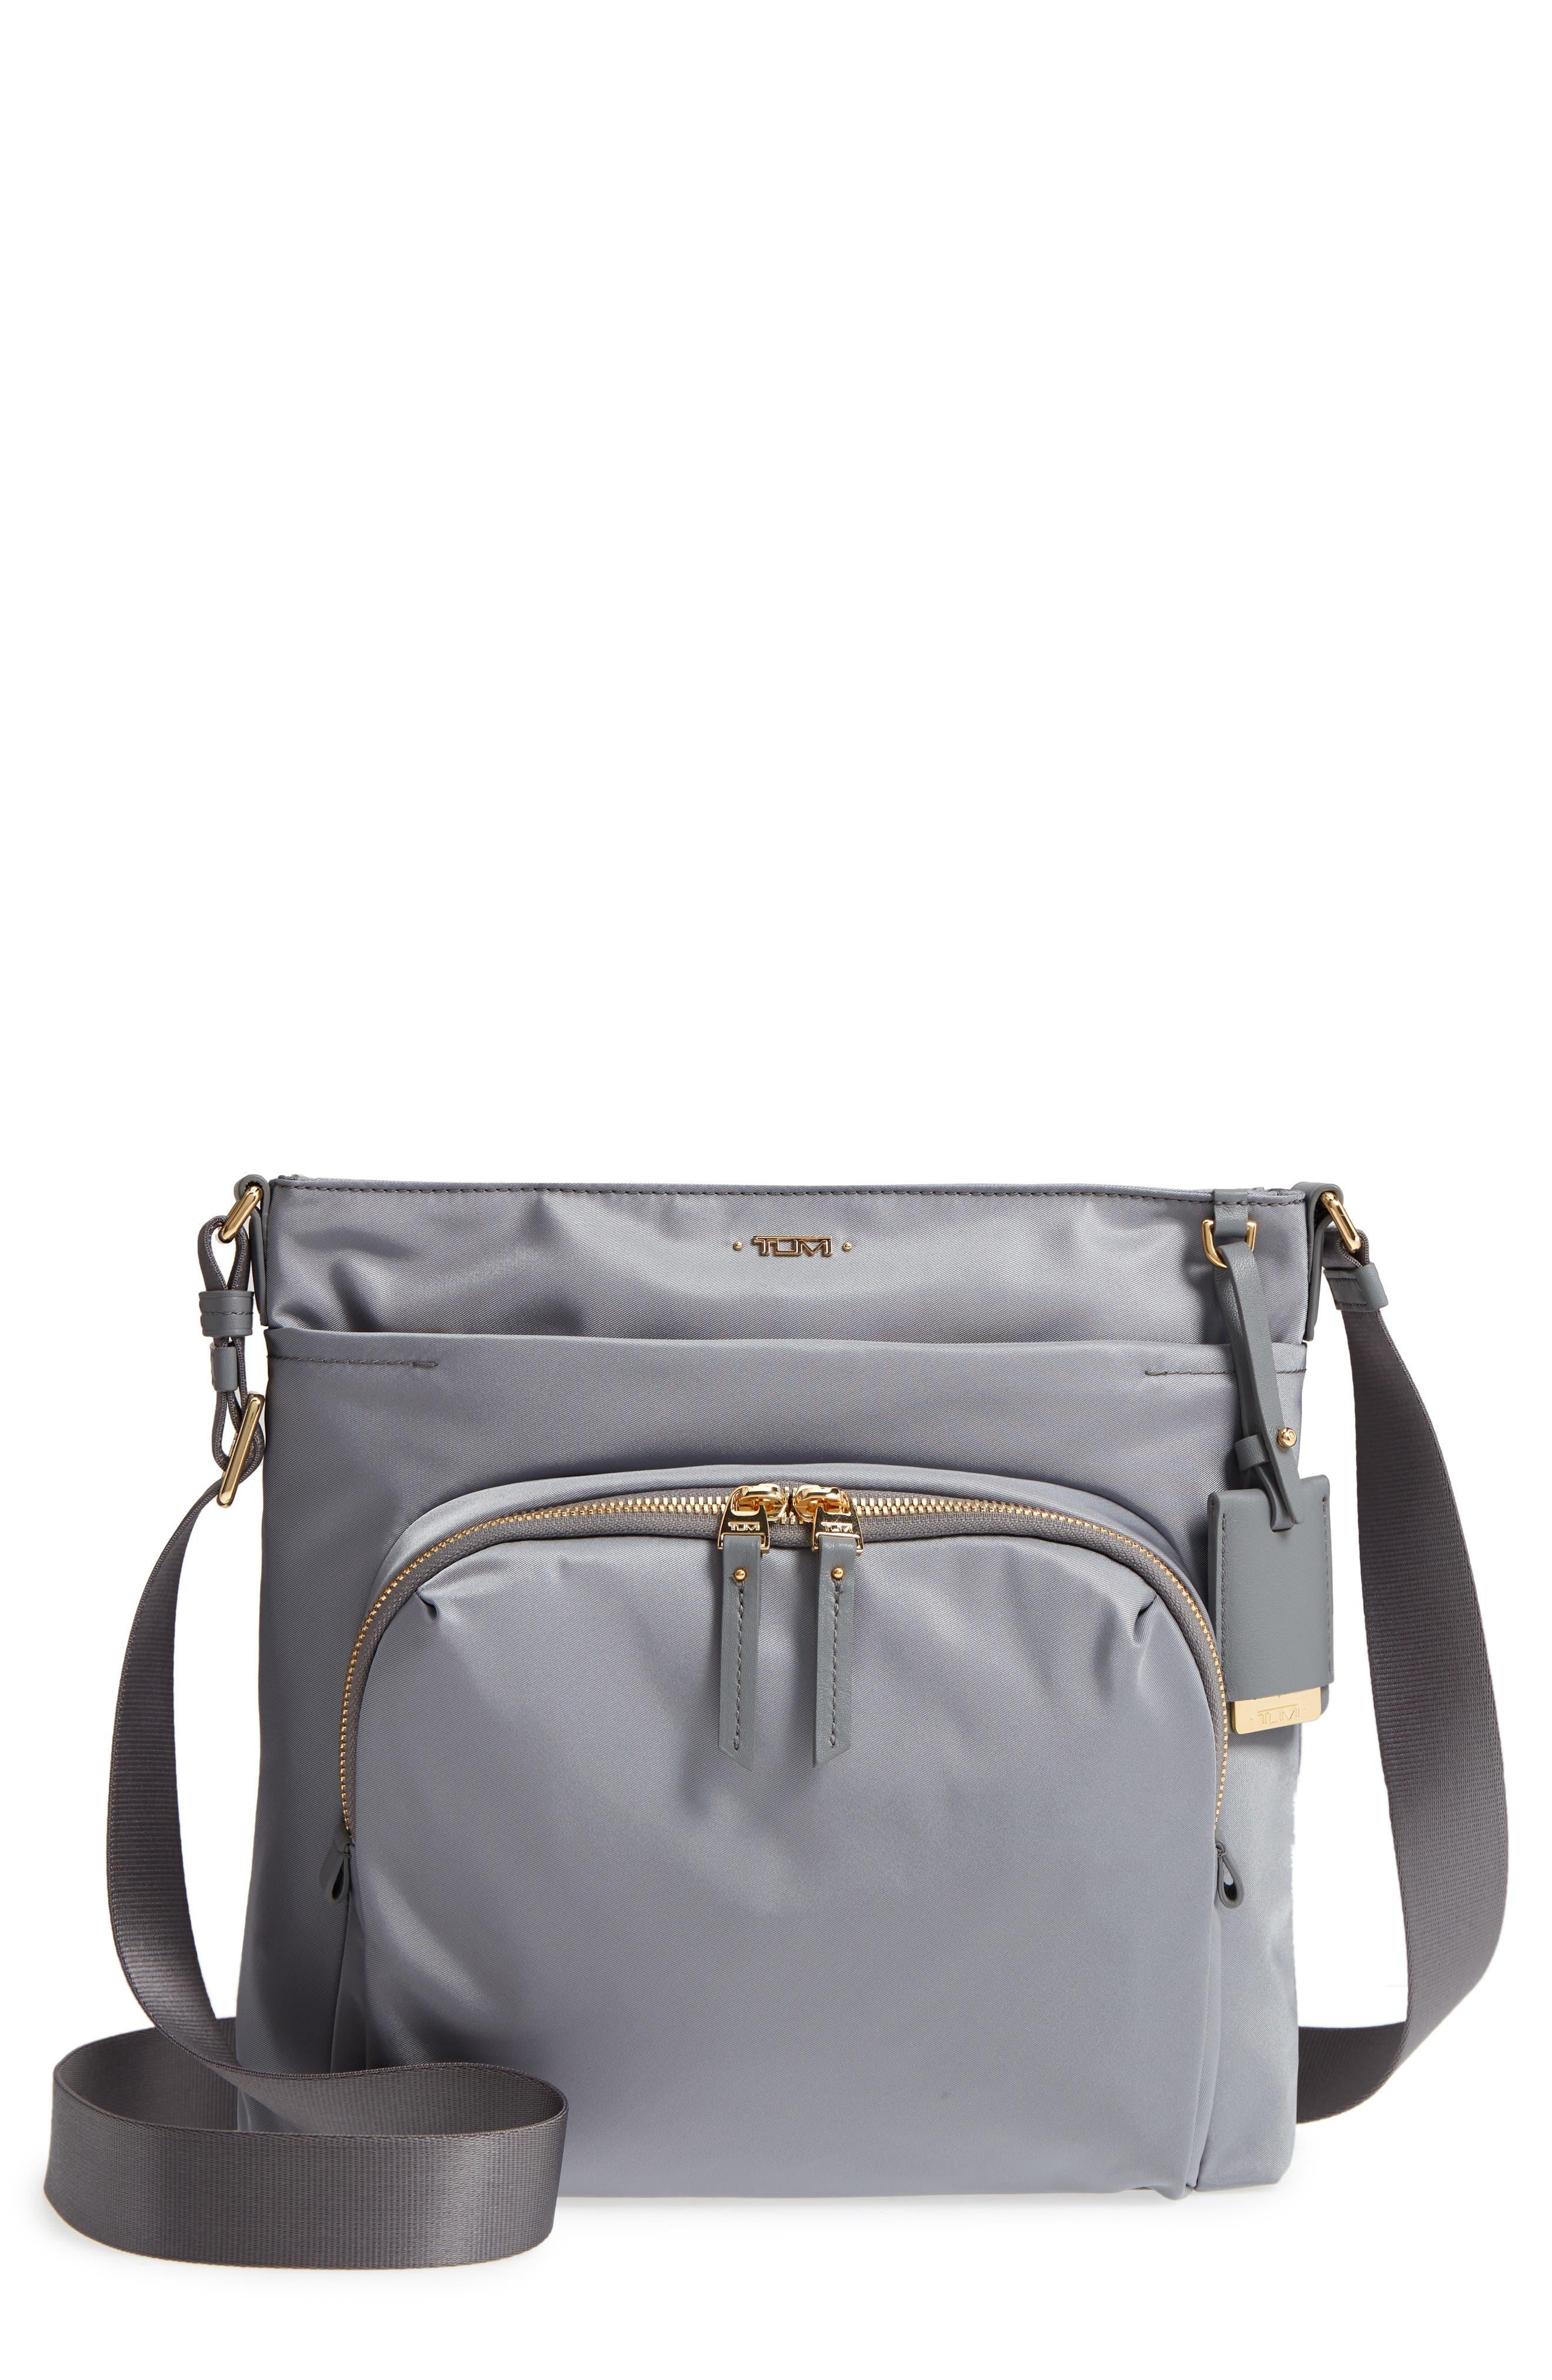 Voyager - Capri Nylon Crossbody Bag,                         Main,                         color, 020